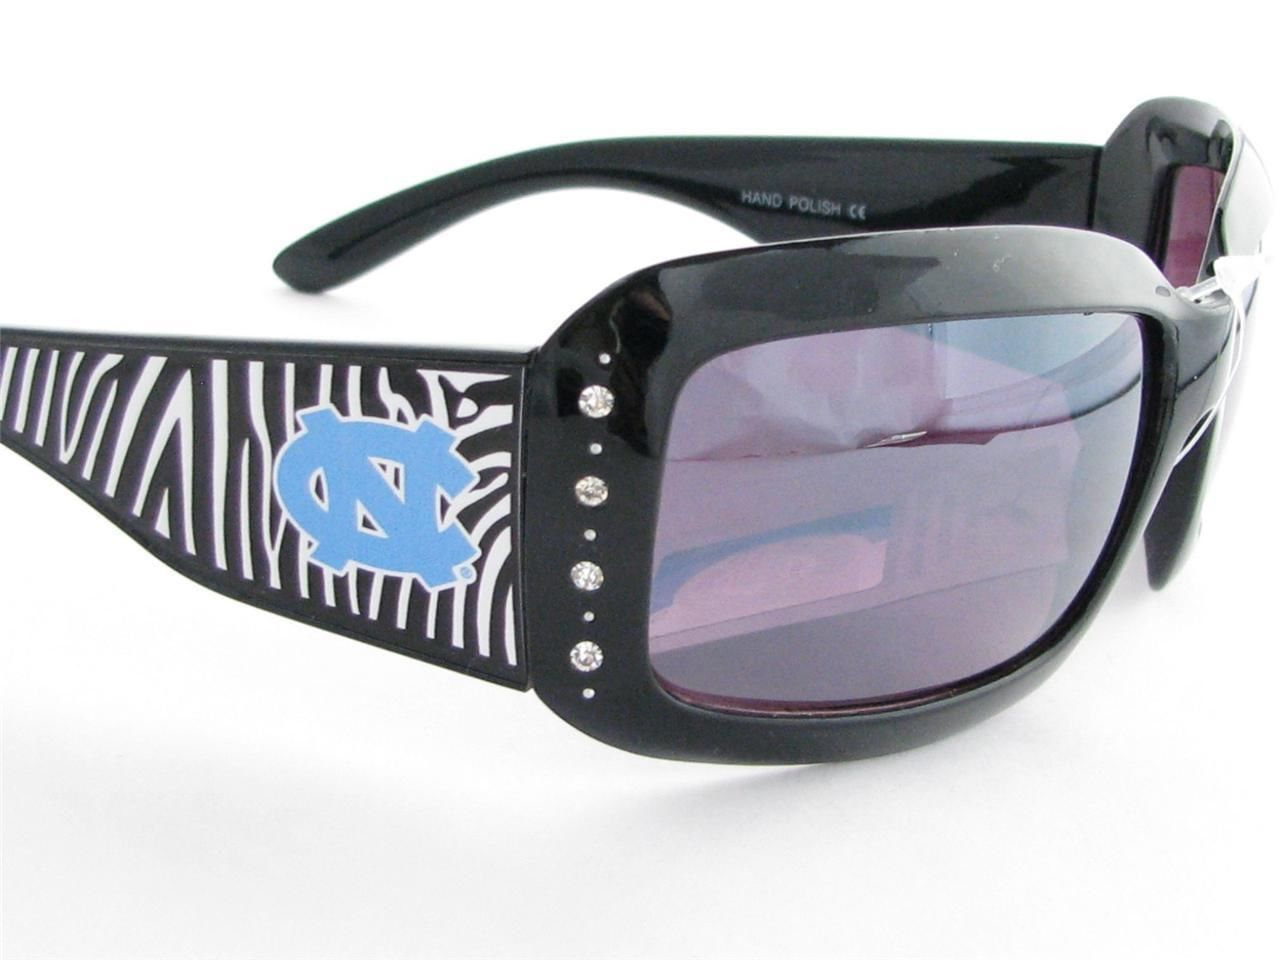 e324f4414388 North Carolina Tar Heels Zebra Womens Sunglasses. North Carolina Tarheels  NCAA Women s Rhinestone Zebra Print Sunglasses Accessories Store ...